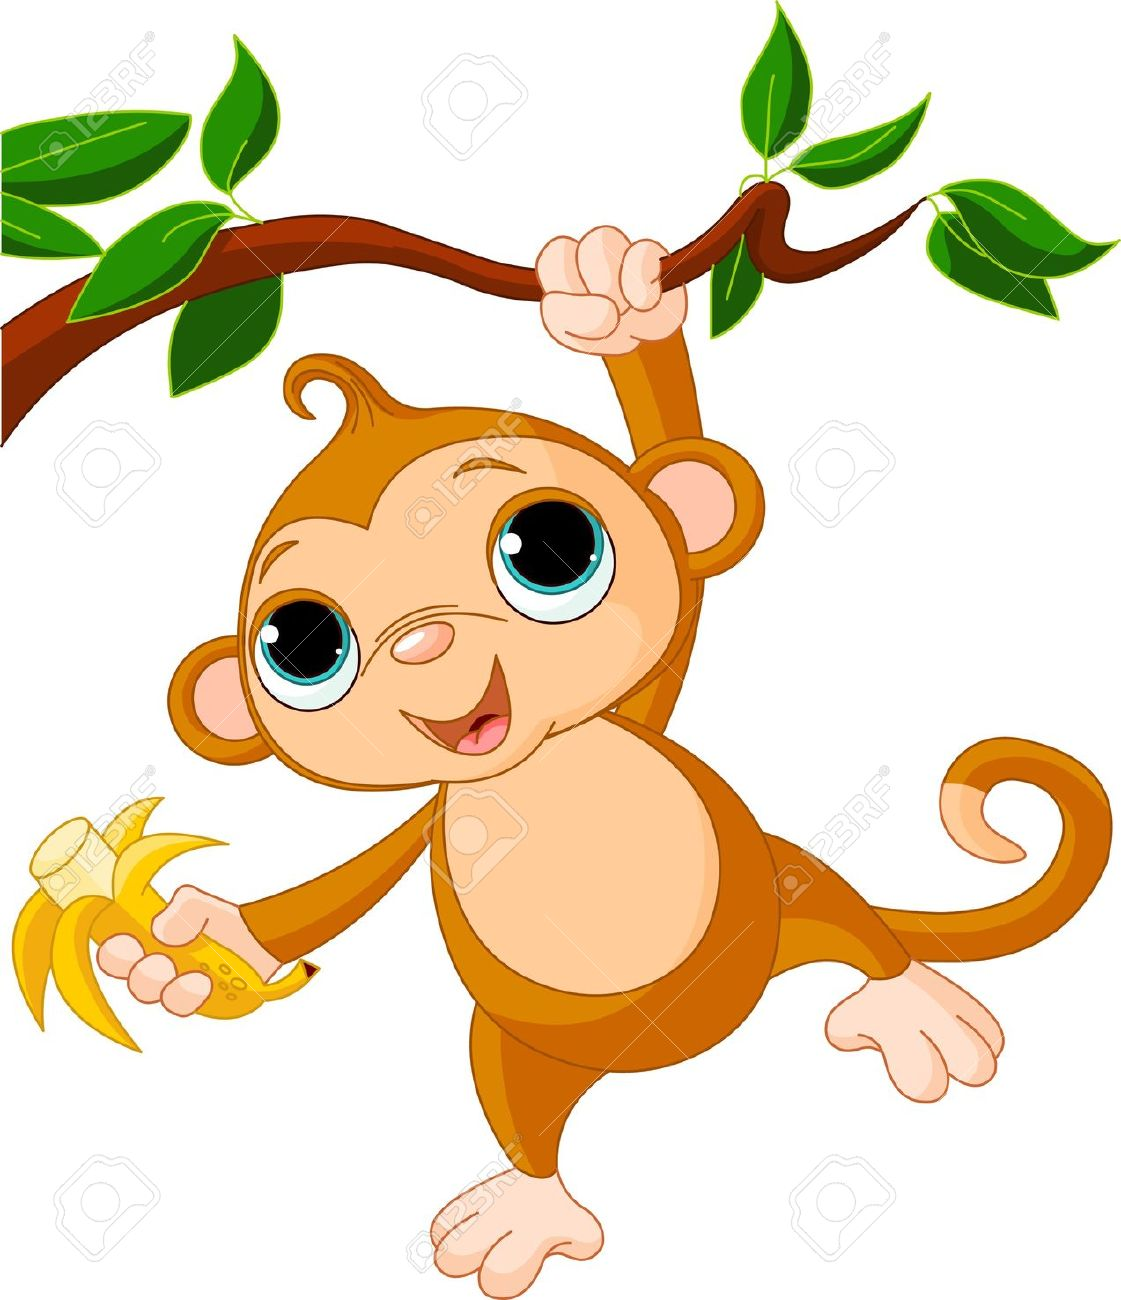 Cute Baby Monkey On A Tree Holding Banana Royalty Free Cliparts.